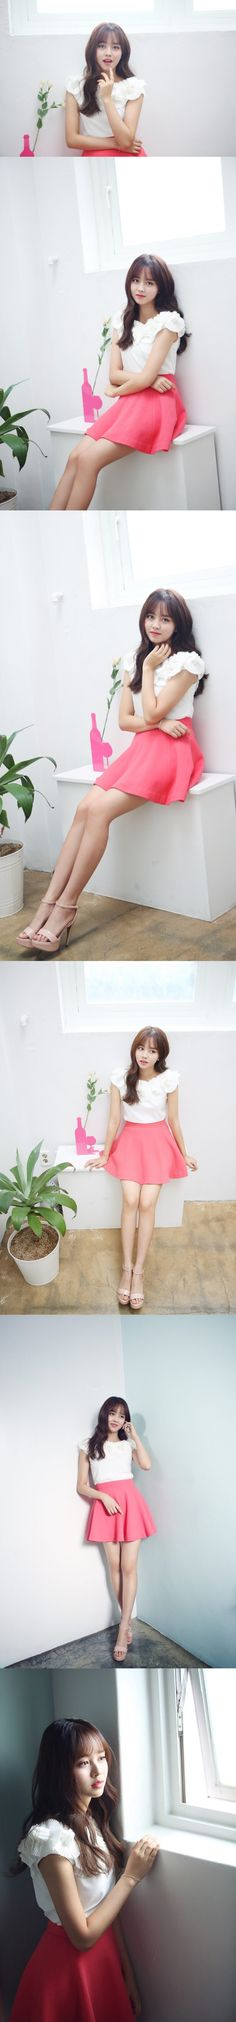 Hyun Ji, Kim Sohyun, Child Actresses, South Korea, Kdrama, Cute, Style, Make Up, Swag